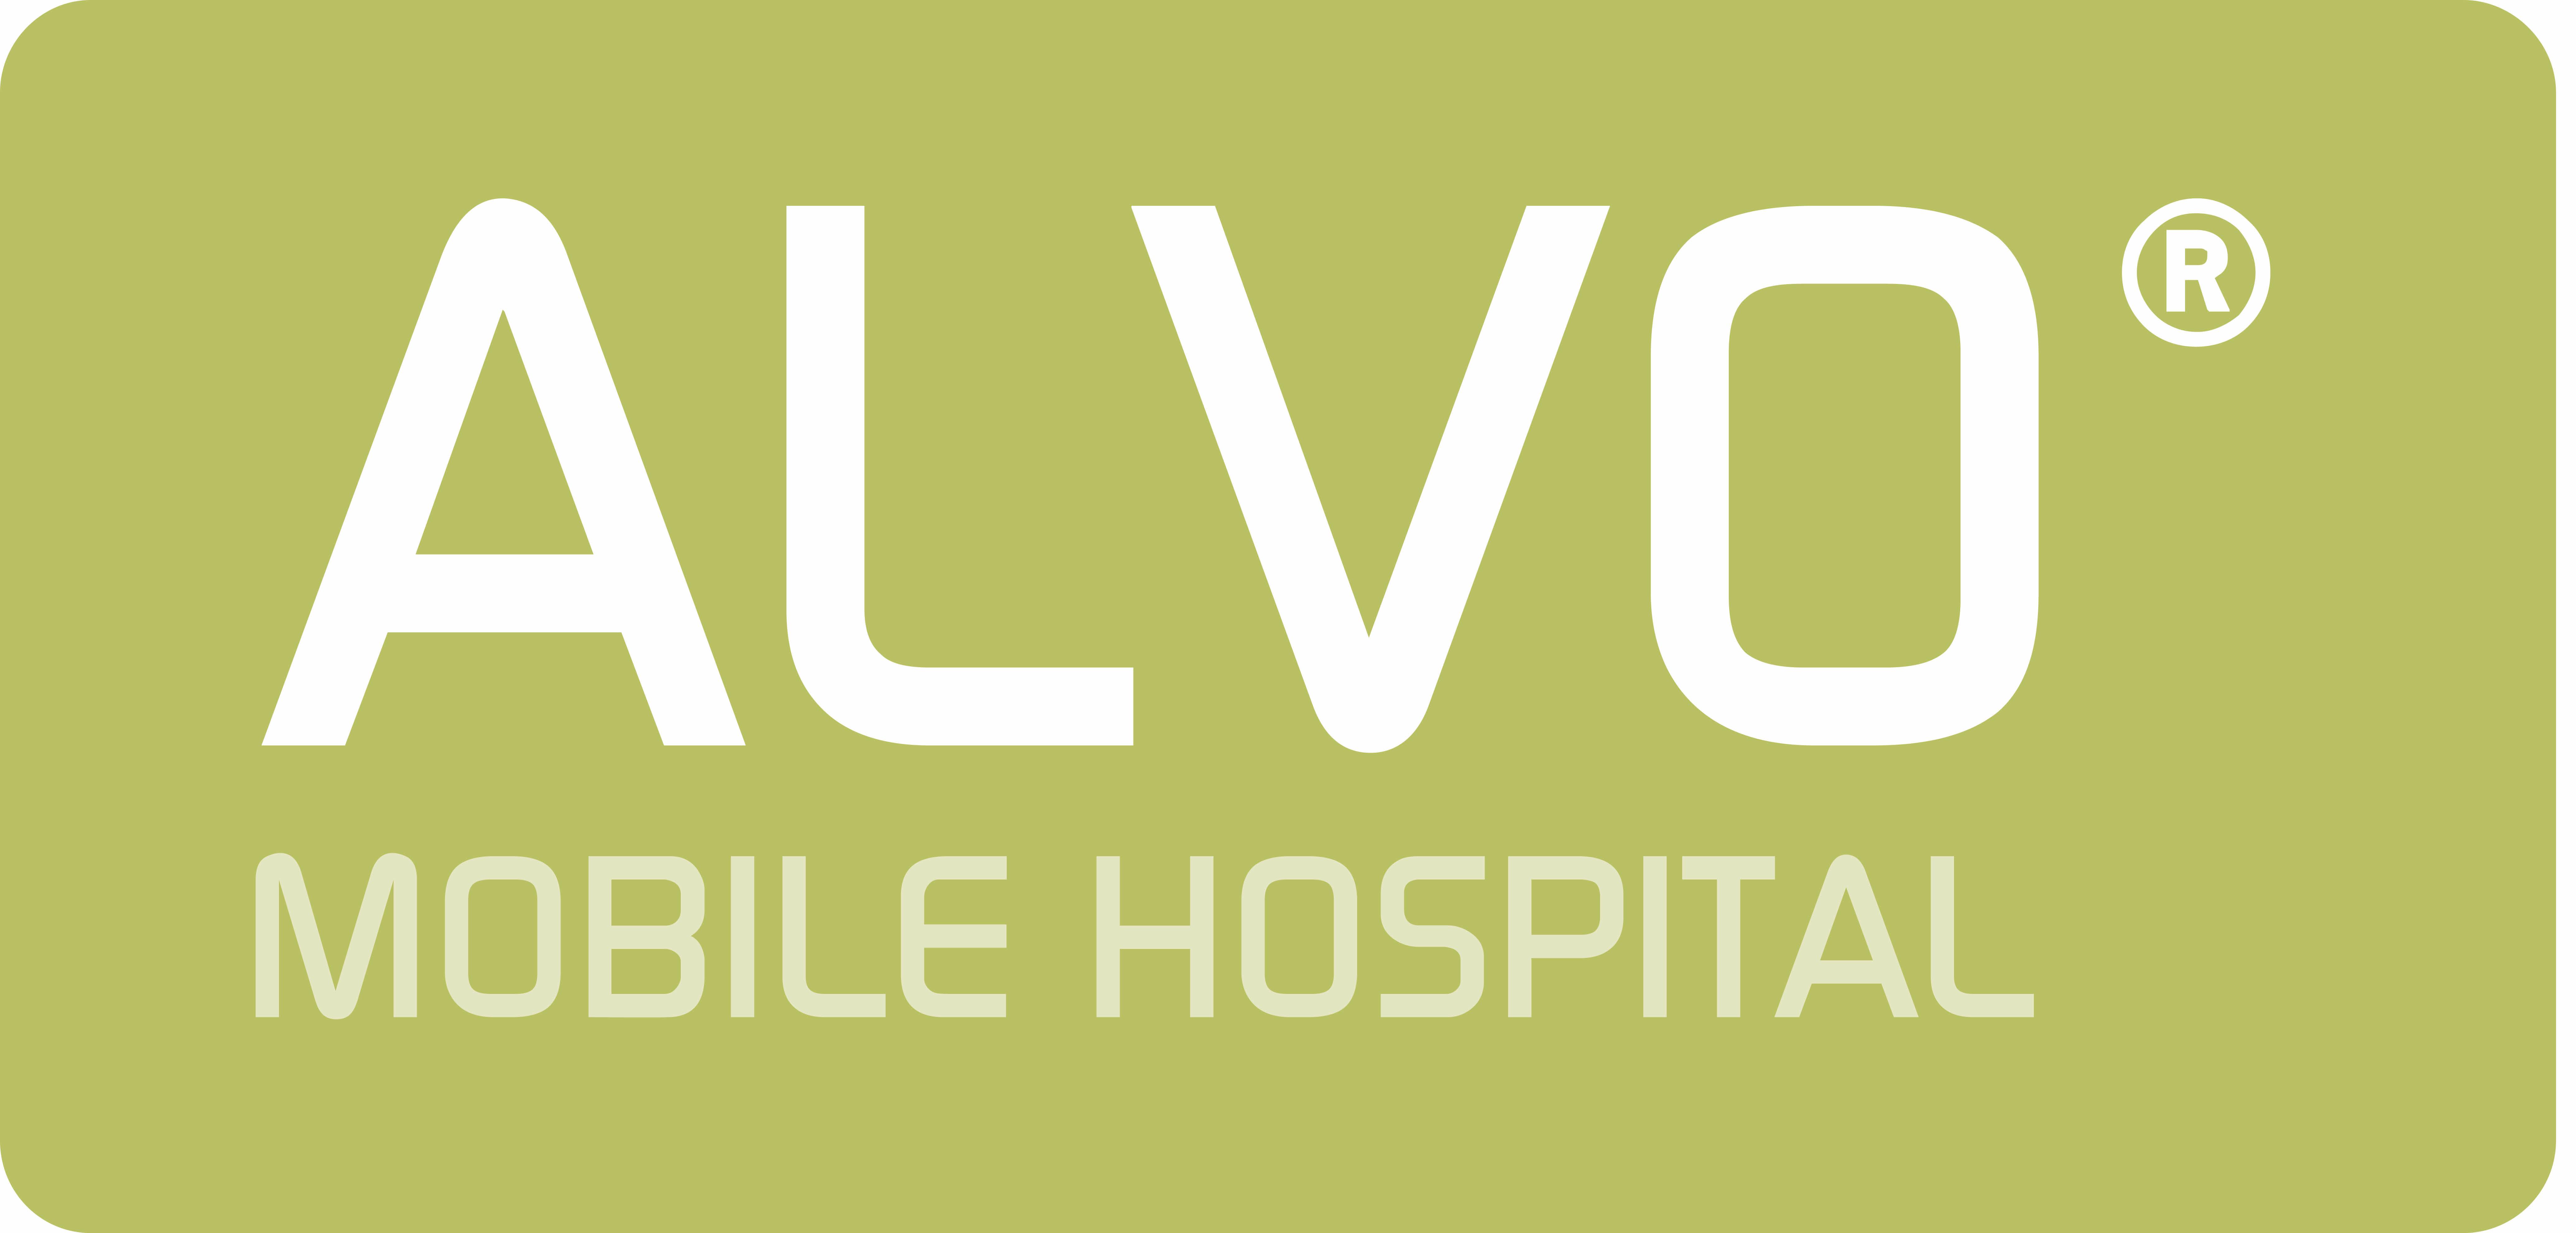 ALVO Mobile Hospital